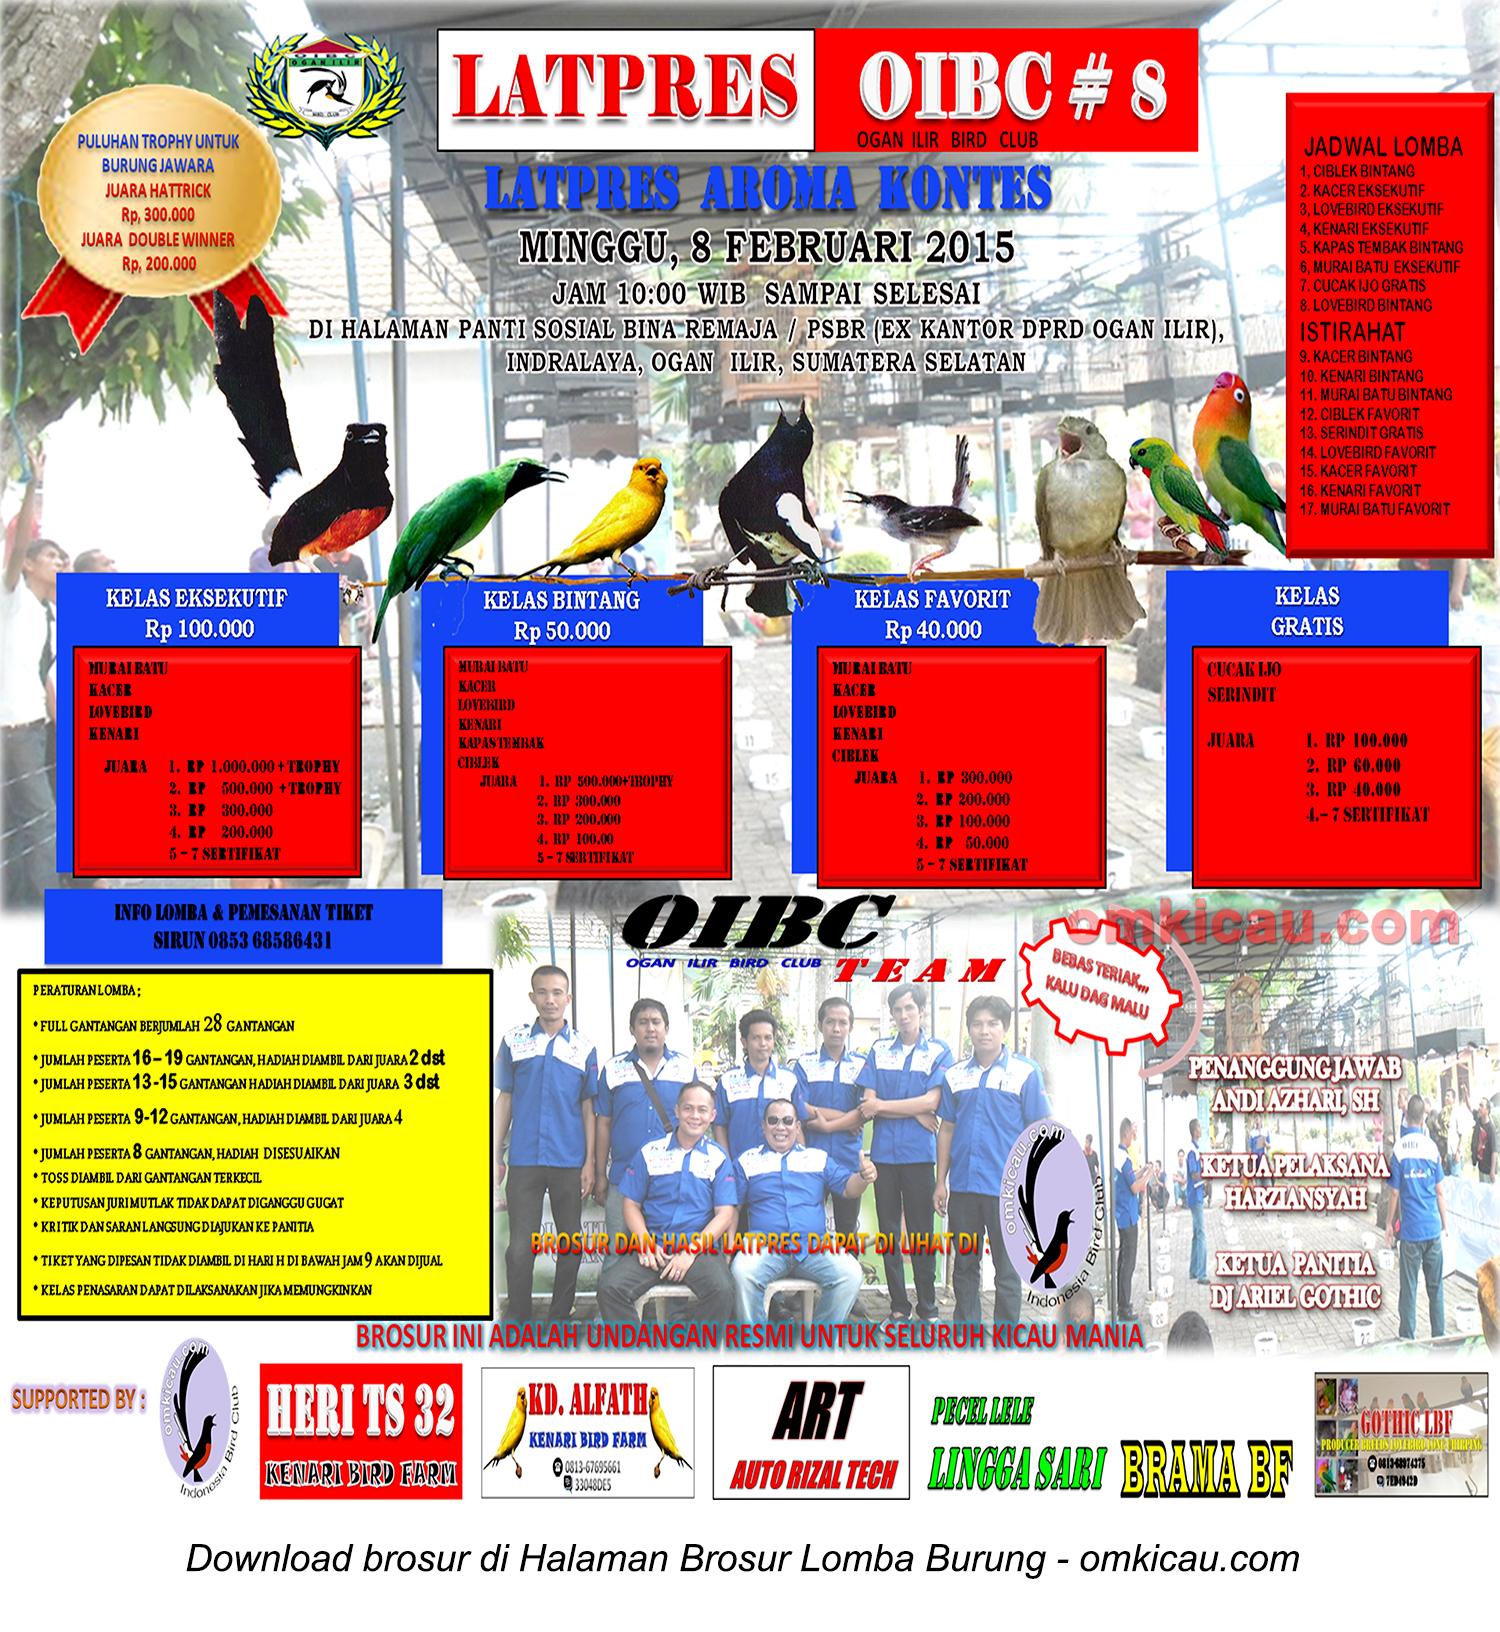 Brosur Latpres Burung Berkicau OIBC #8, Ogan Ilir, 8 Februari 2015